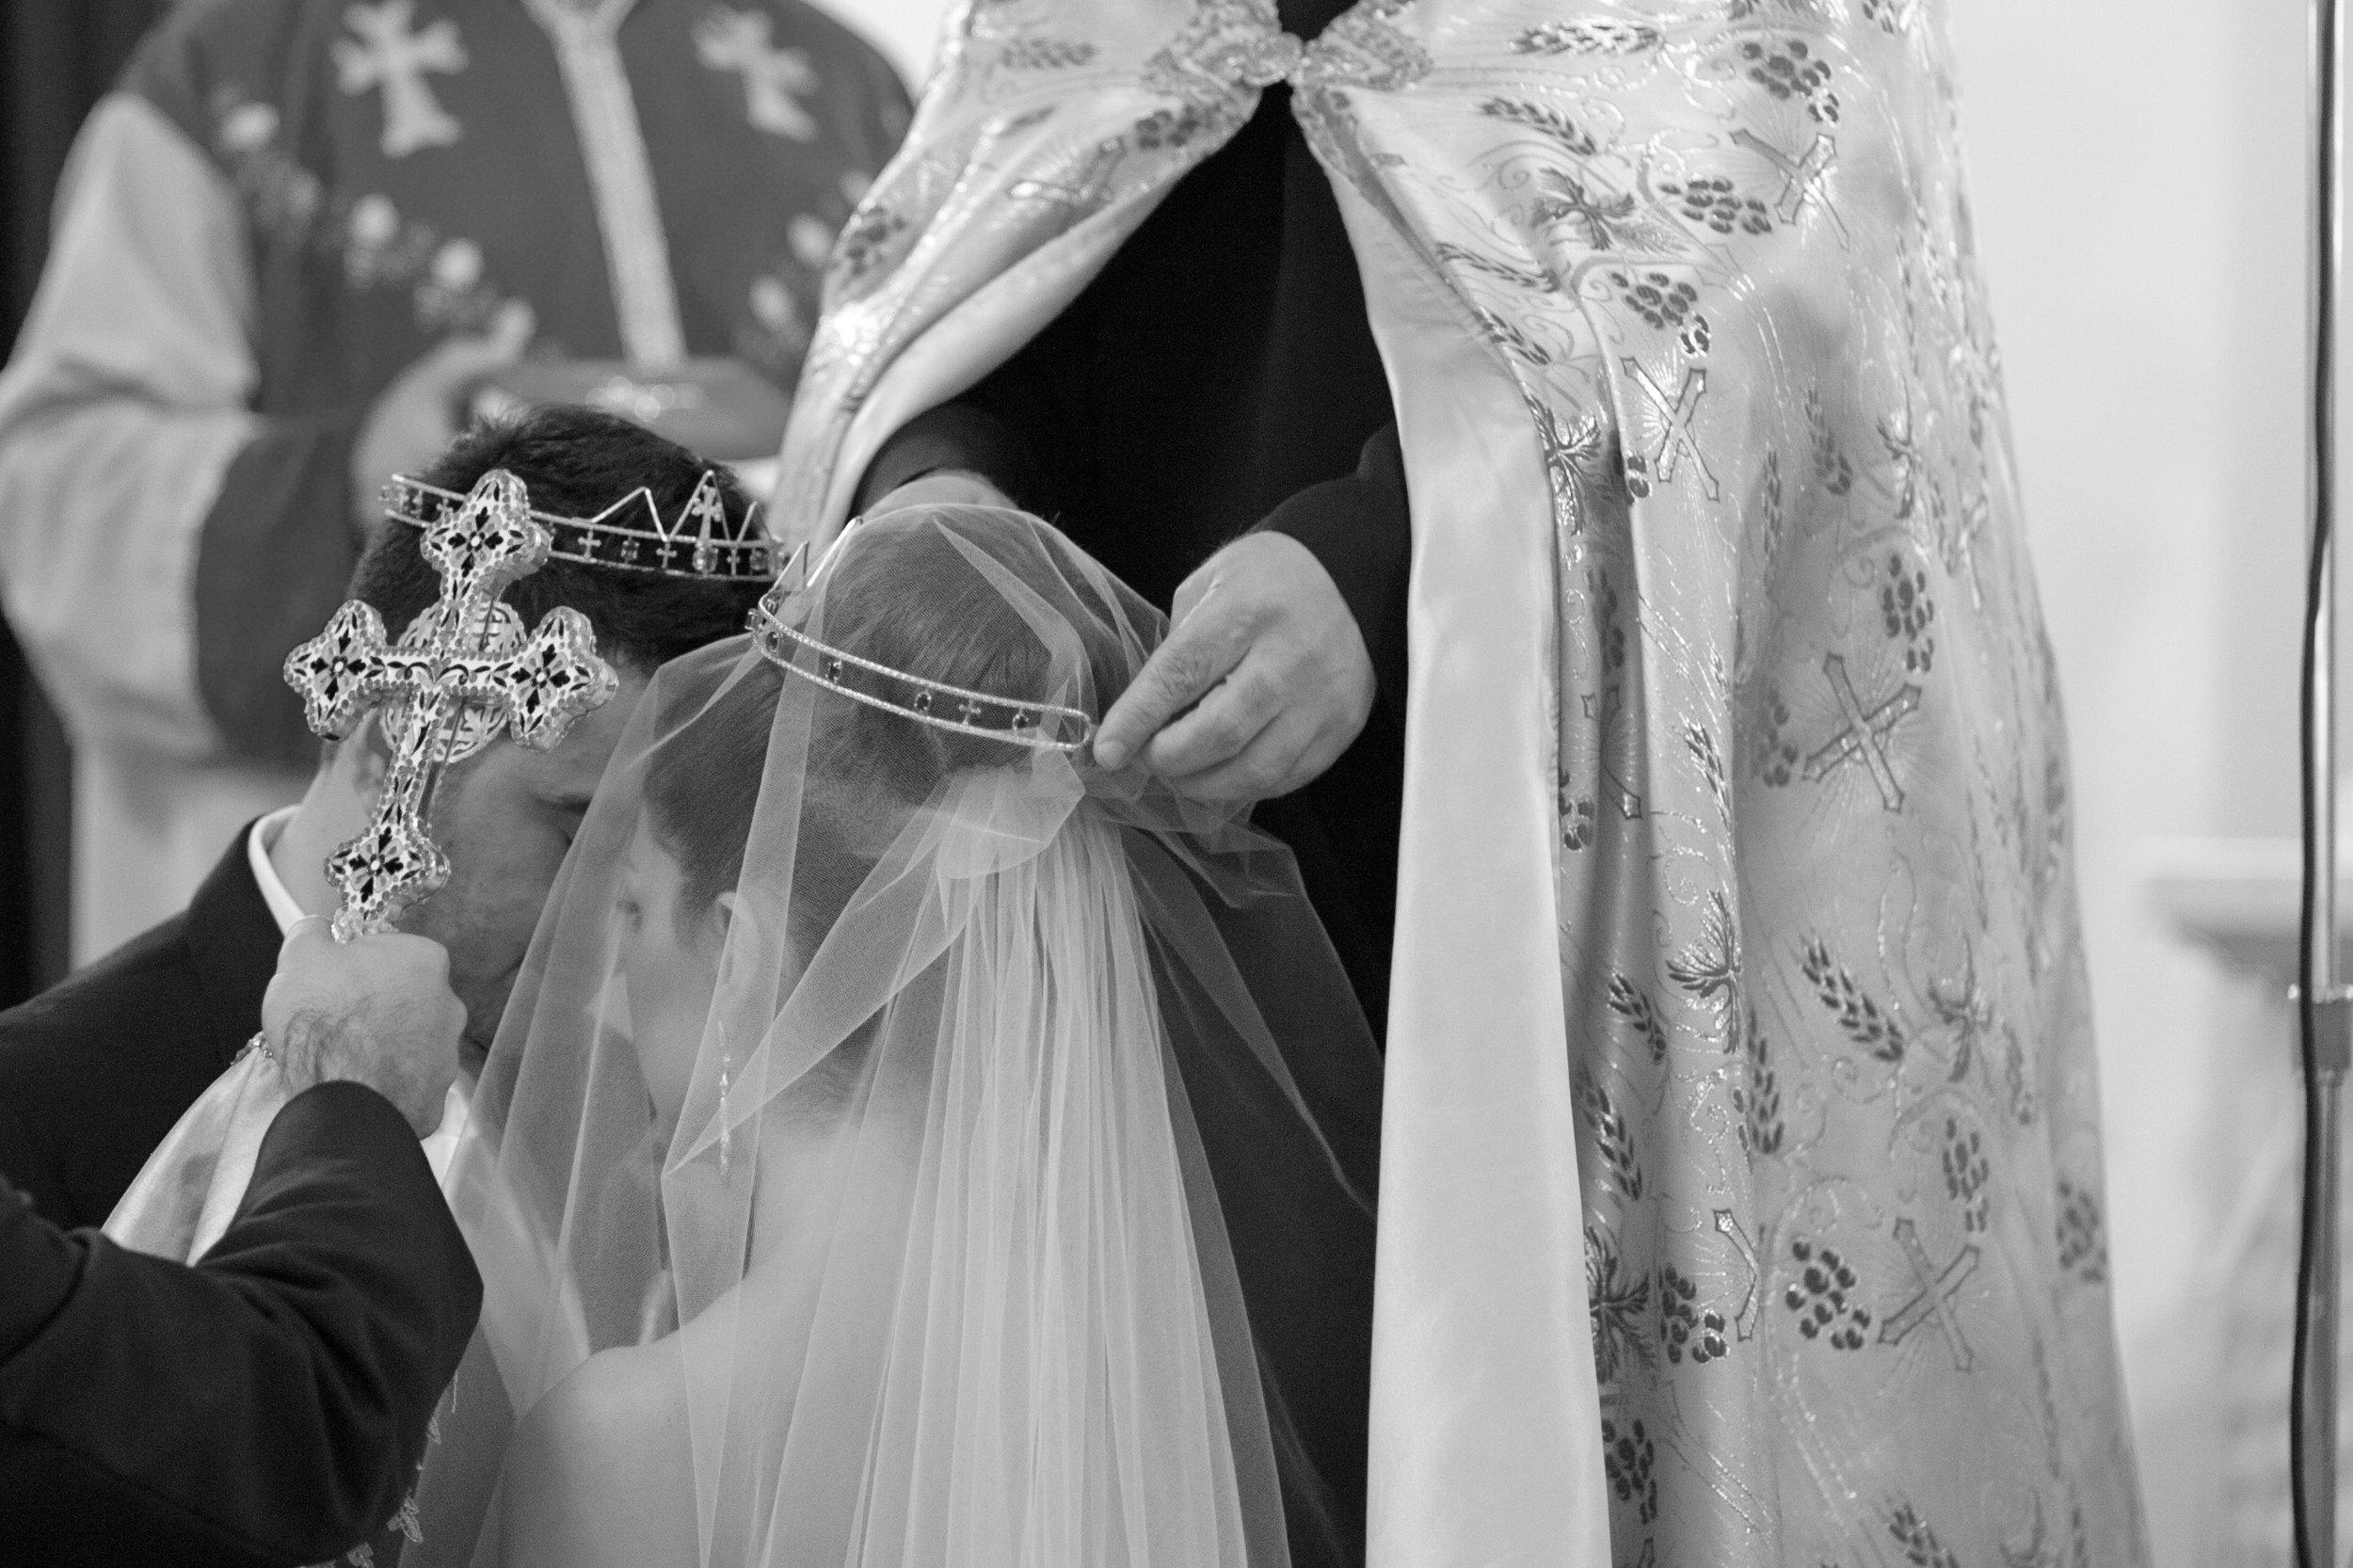 Groom and veiled bride during Catholic wedding ceremony